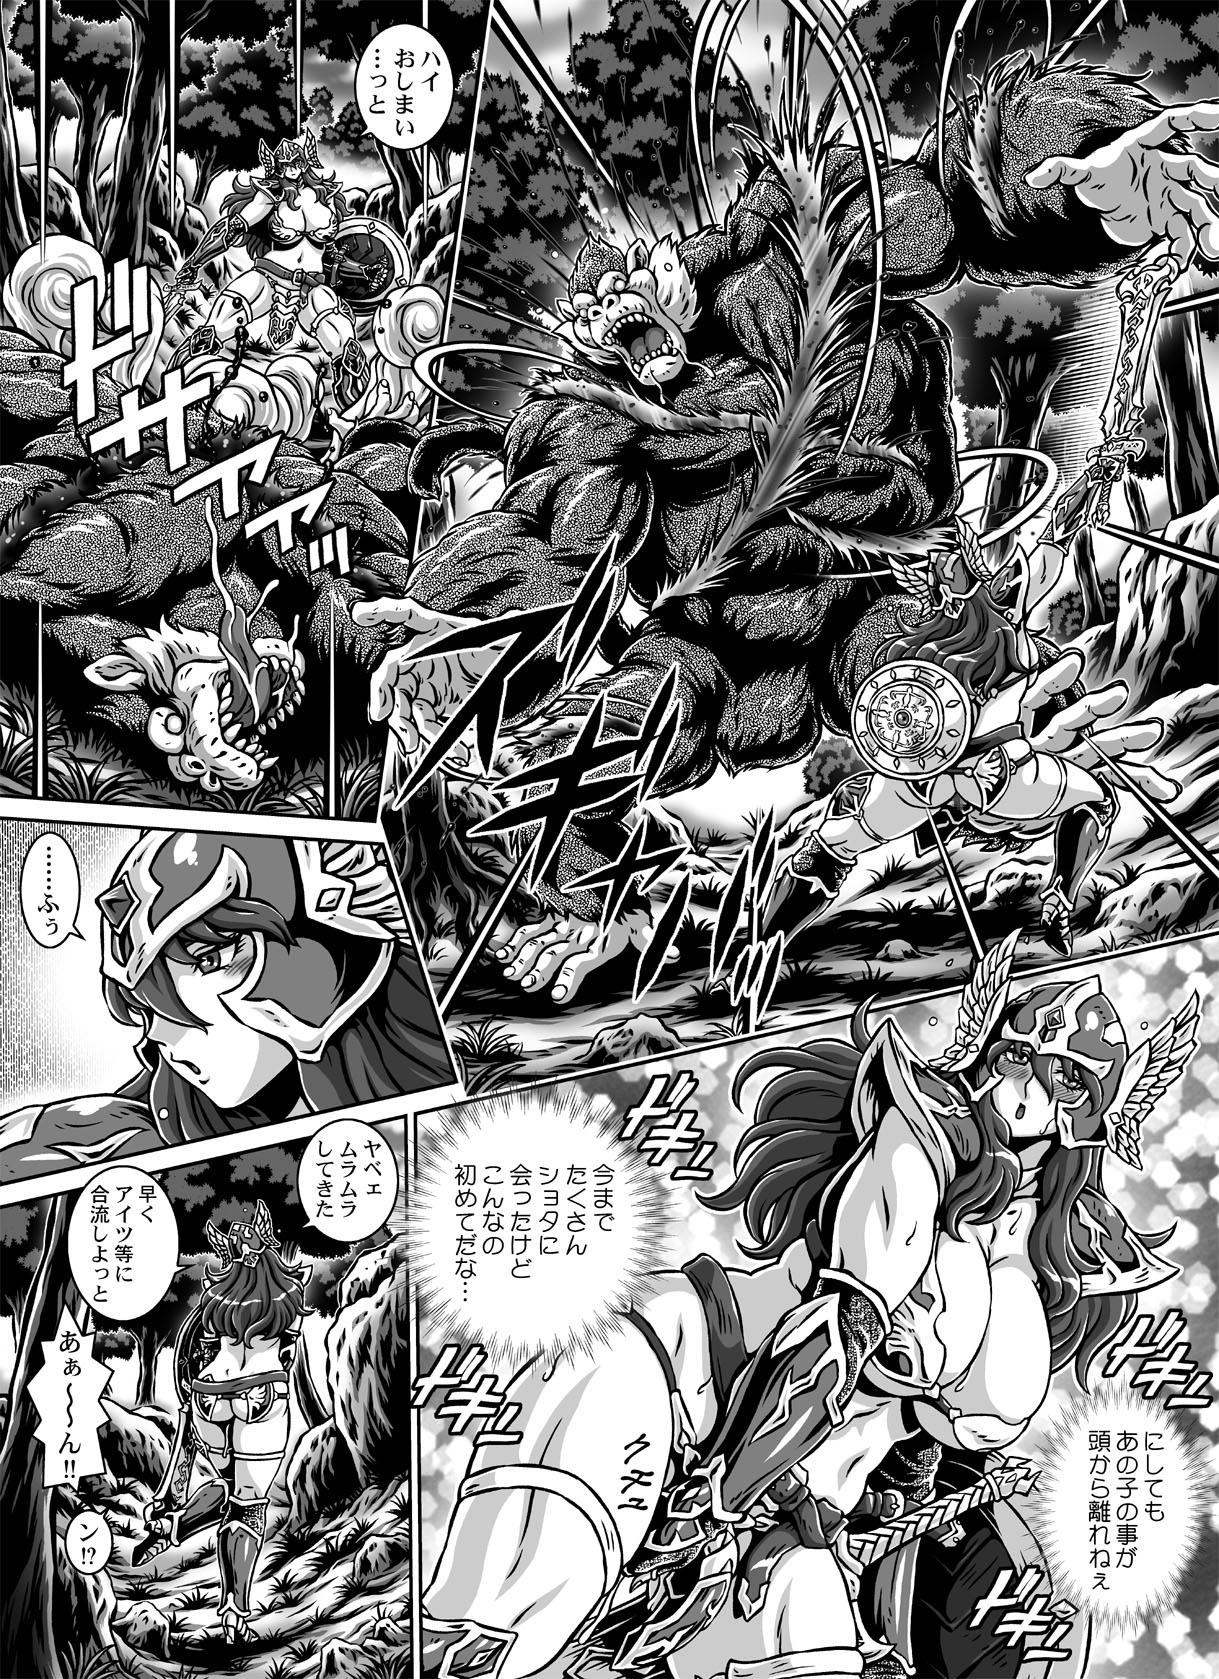 [Naginata-kan (Matsurino Naginata)] D-Q-R ~PROOF OF THE HERO~ (Dragon Quest III) [Digital] 23